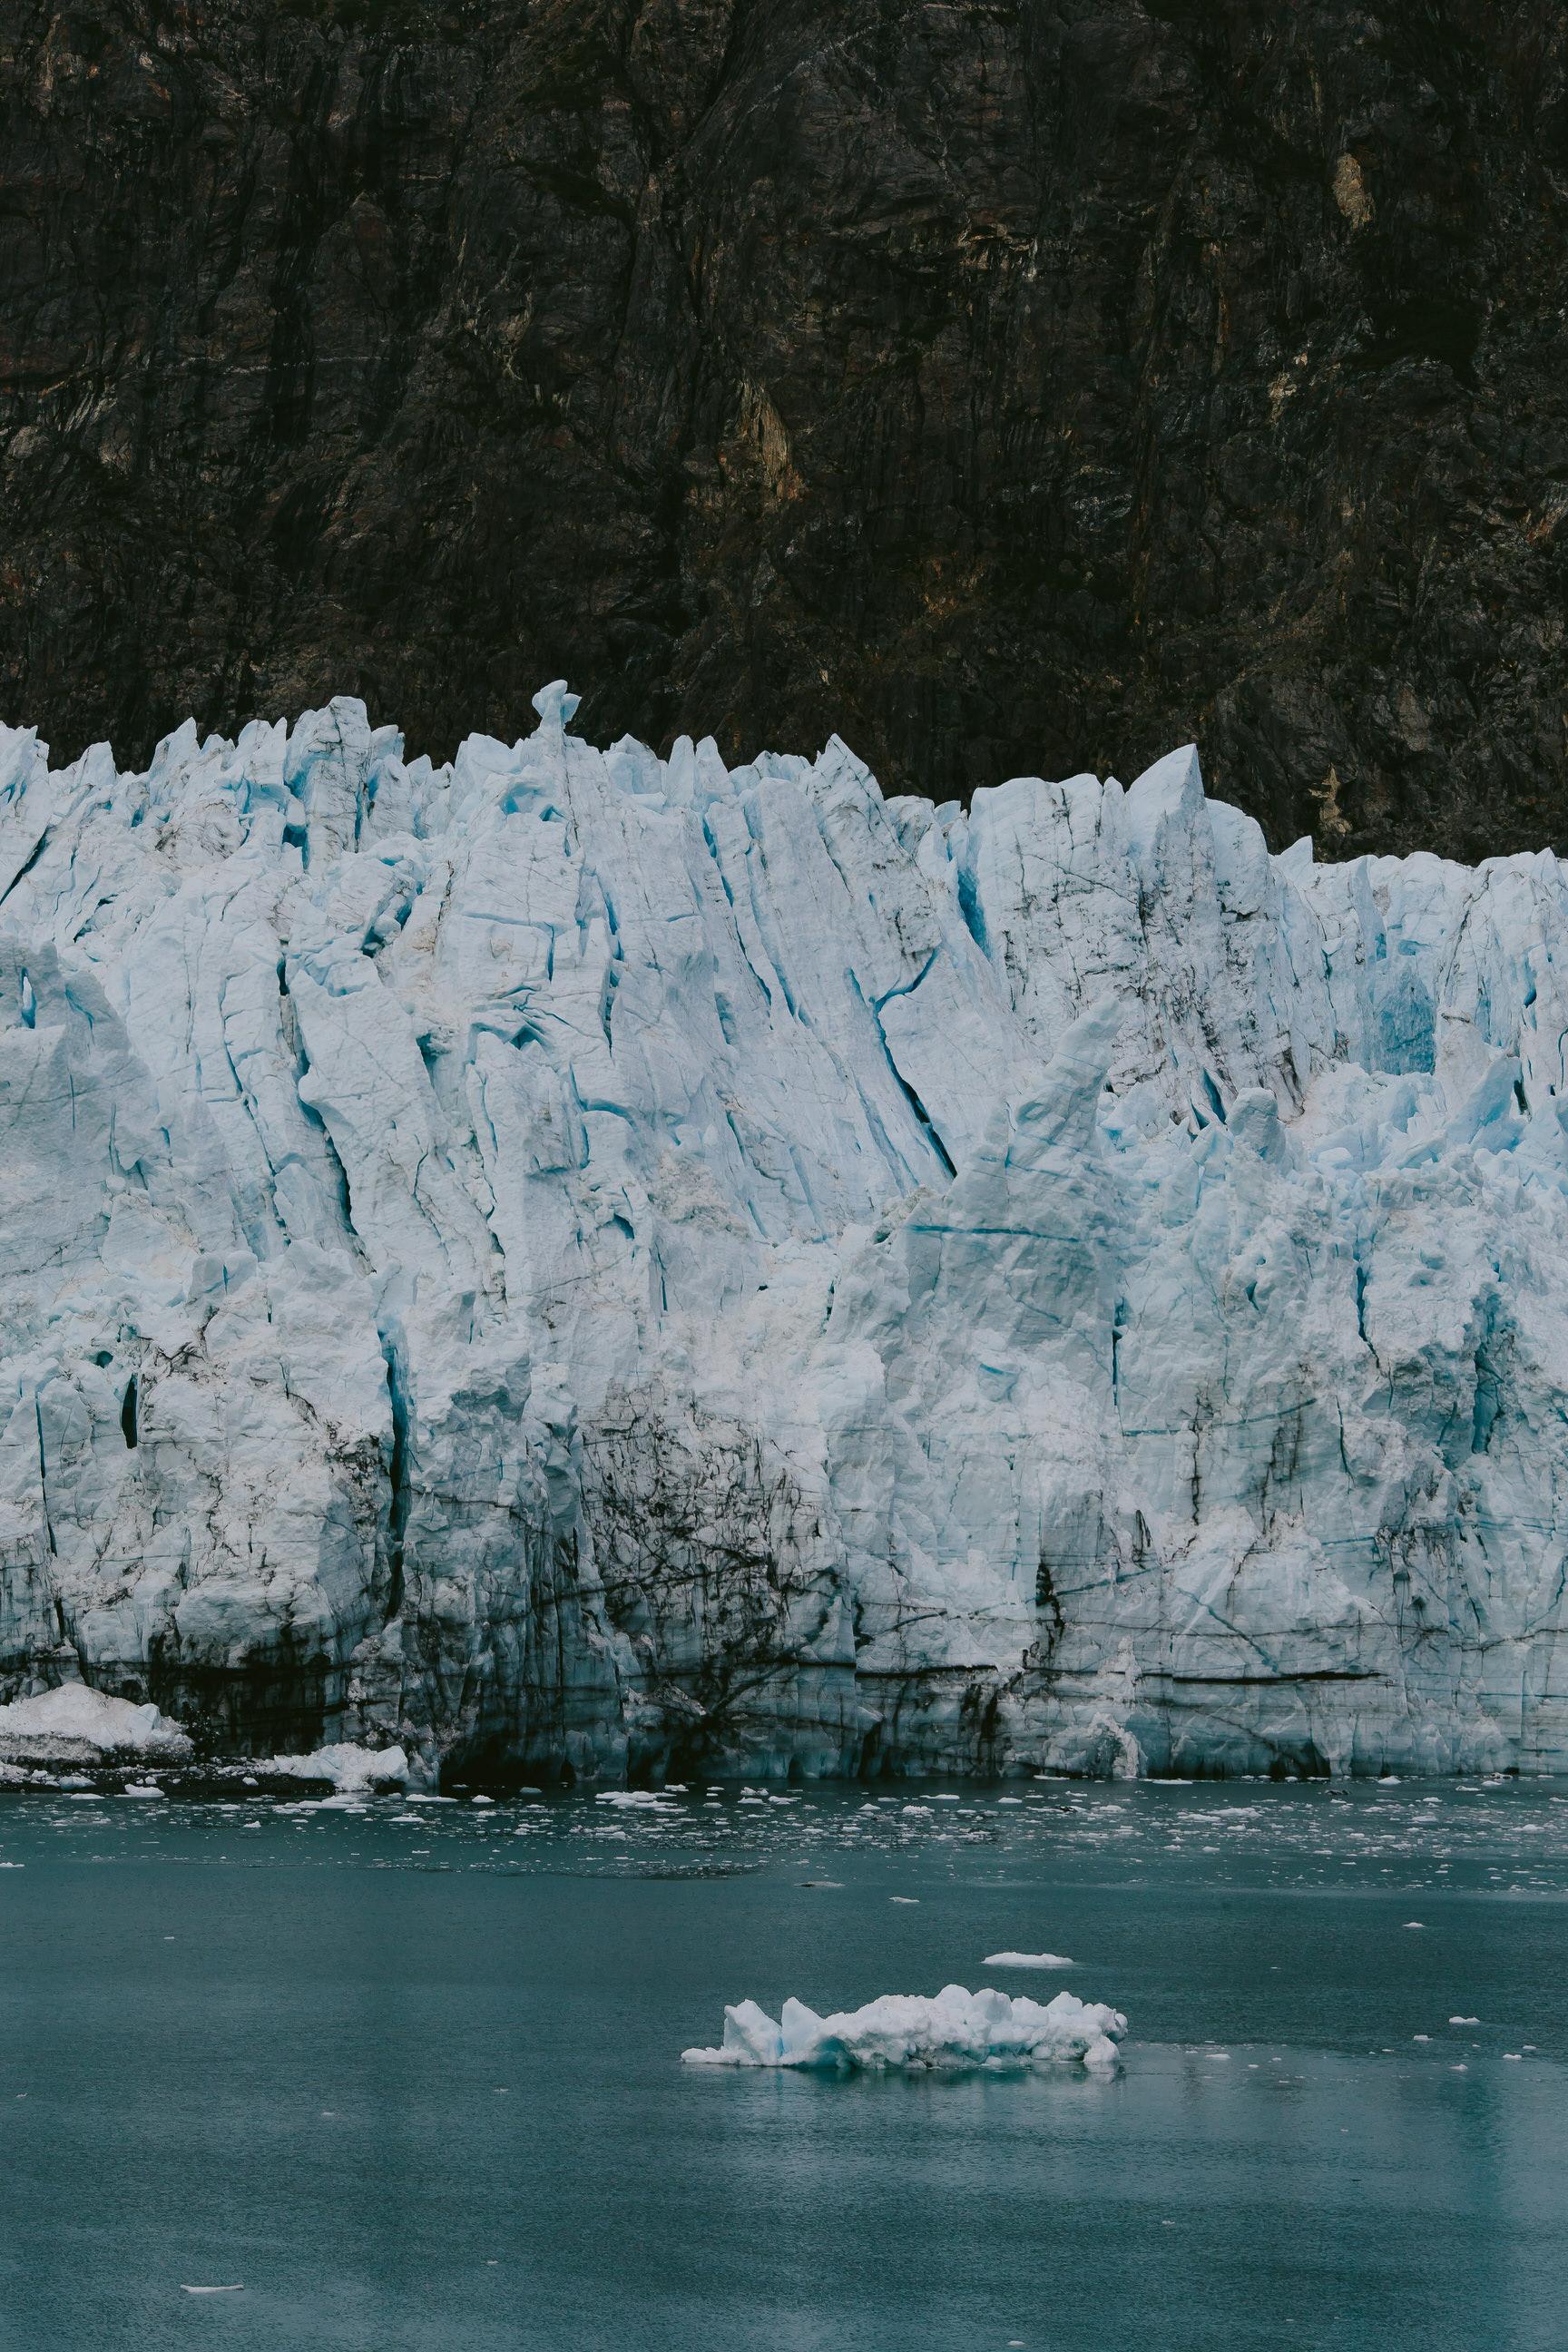 blue_glaciers_glacier_bay_tiny_house_photo_nature_photography-1.jpg